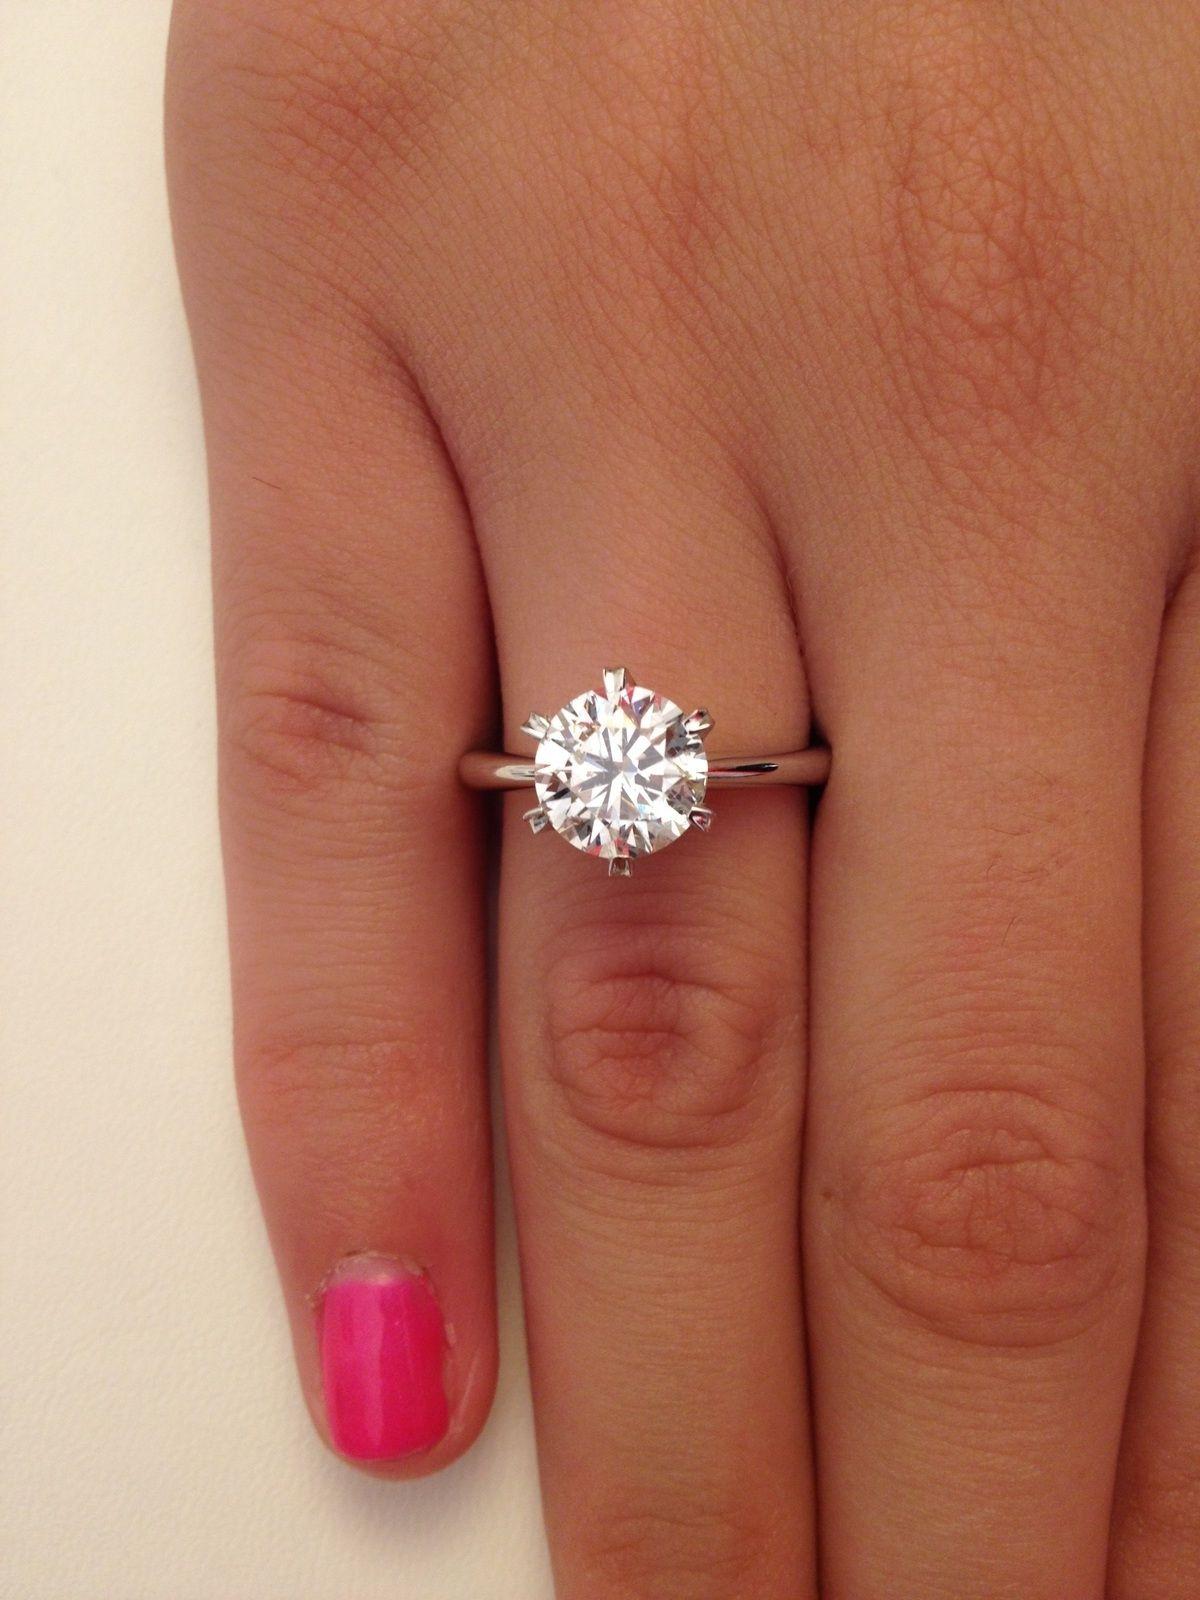 61574ddf2 2.5 Carat Tiffany Engagement Ring | Ring | Tiffany engagement ...